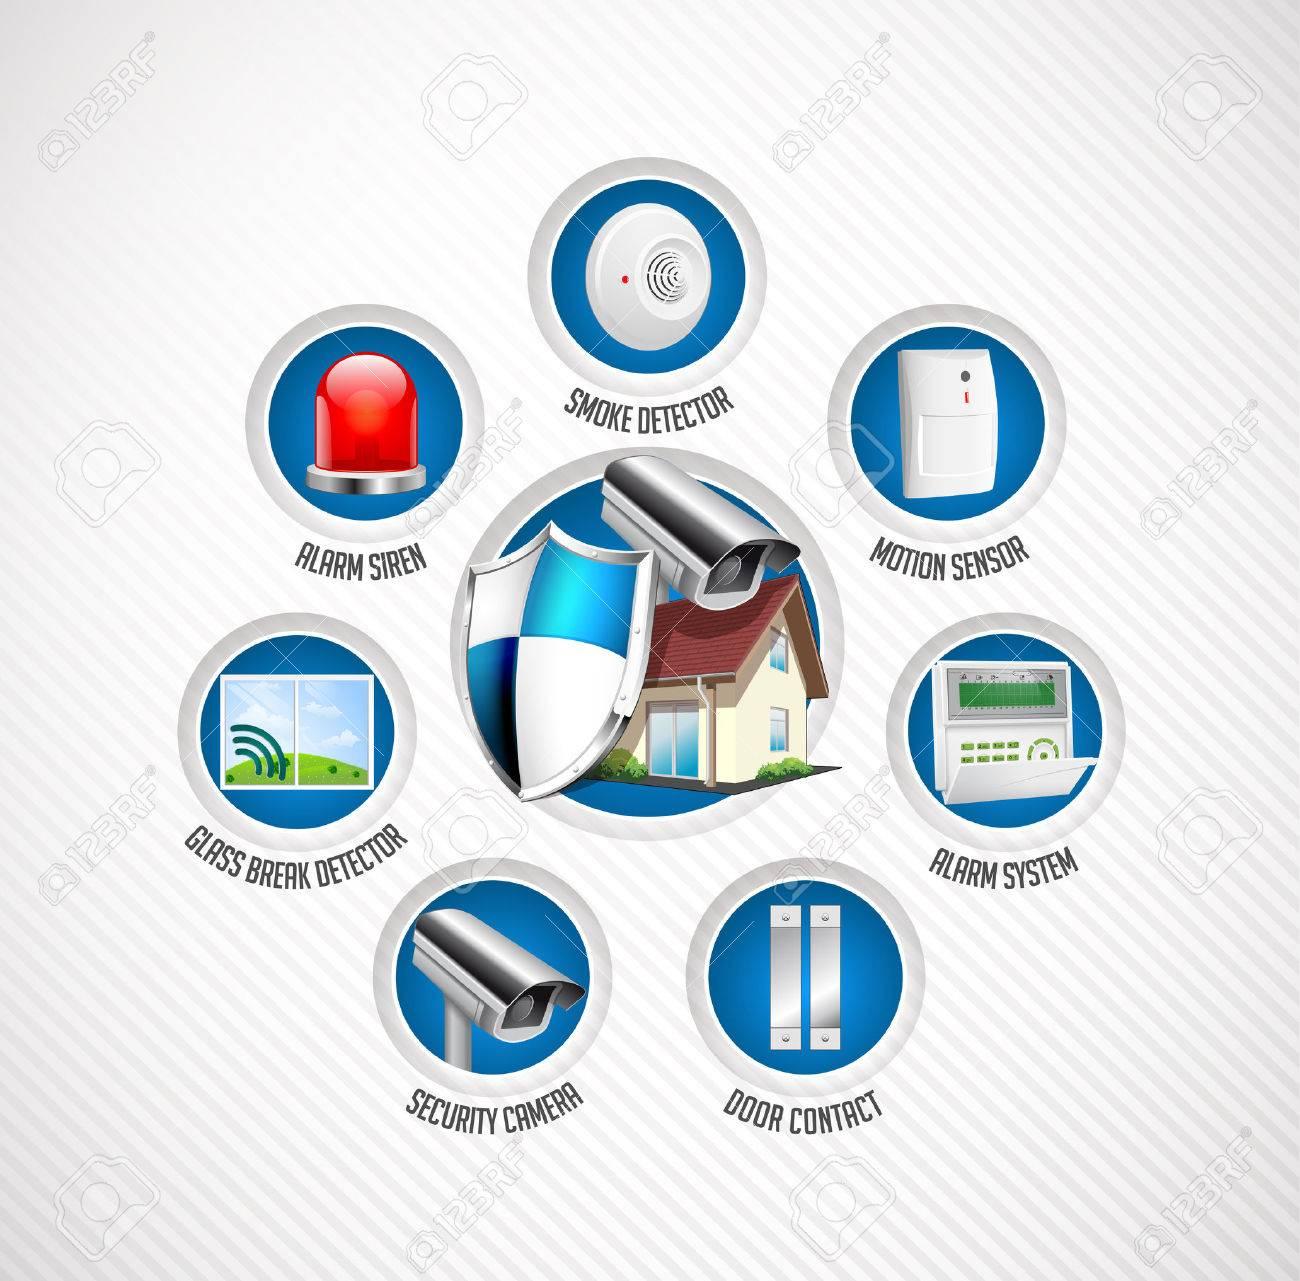 Home security system - motion detector, glass break sensor, gas detector, cctv camera, alarm siren alarm system concept - 51027355